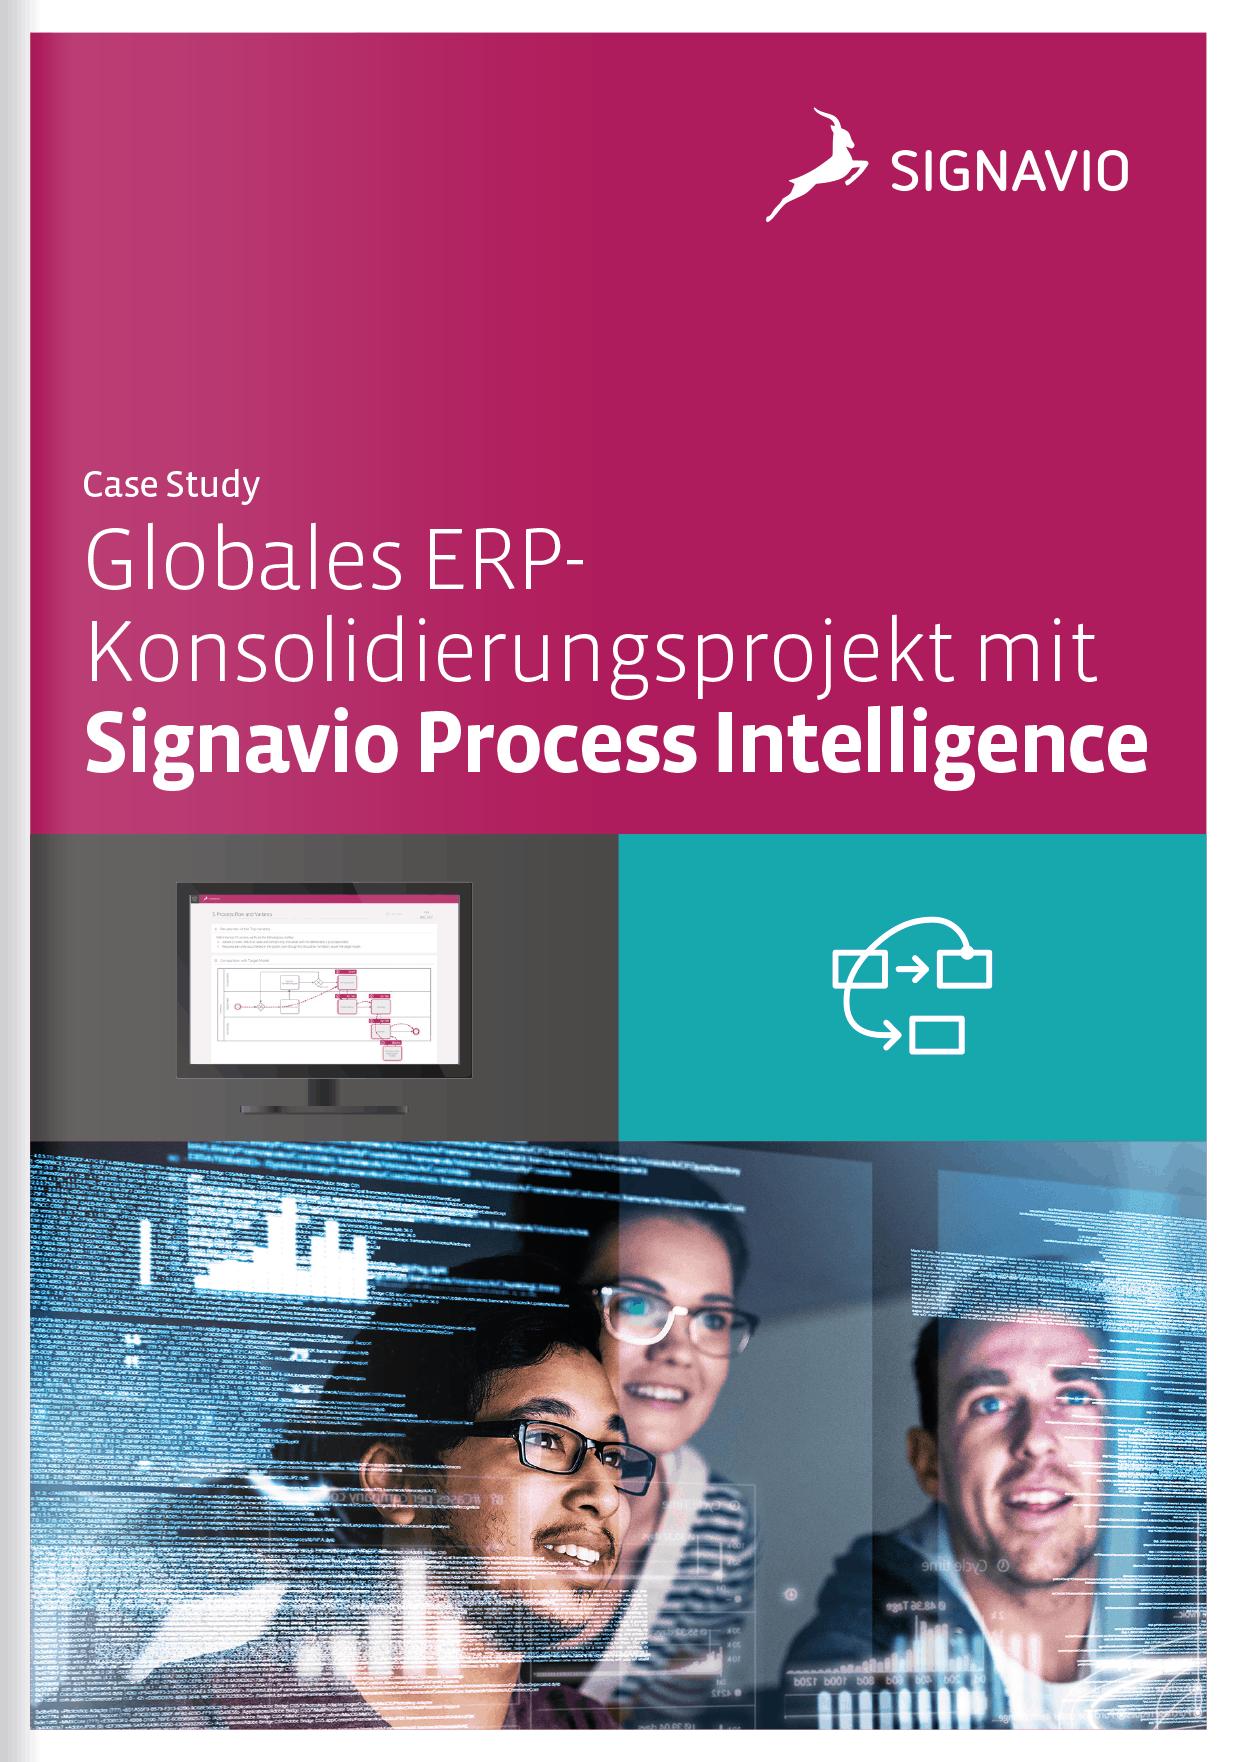 Process Mining mit Signavio: Cover Image